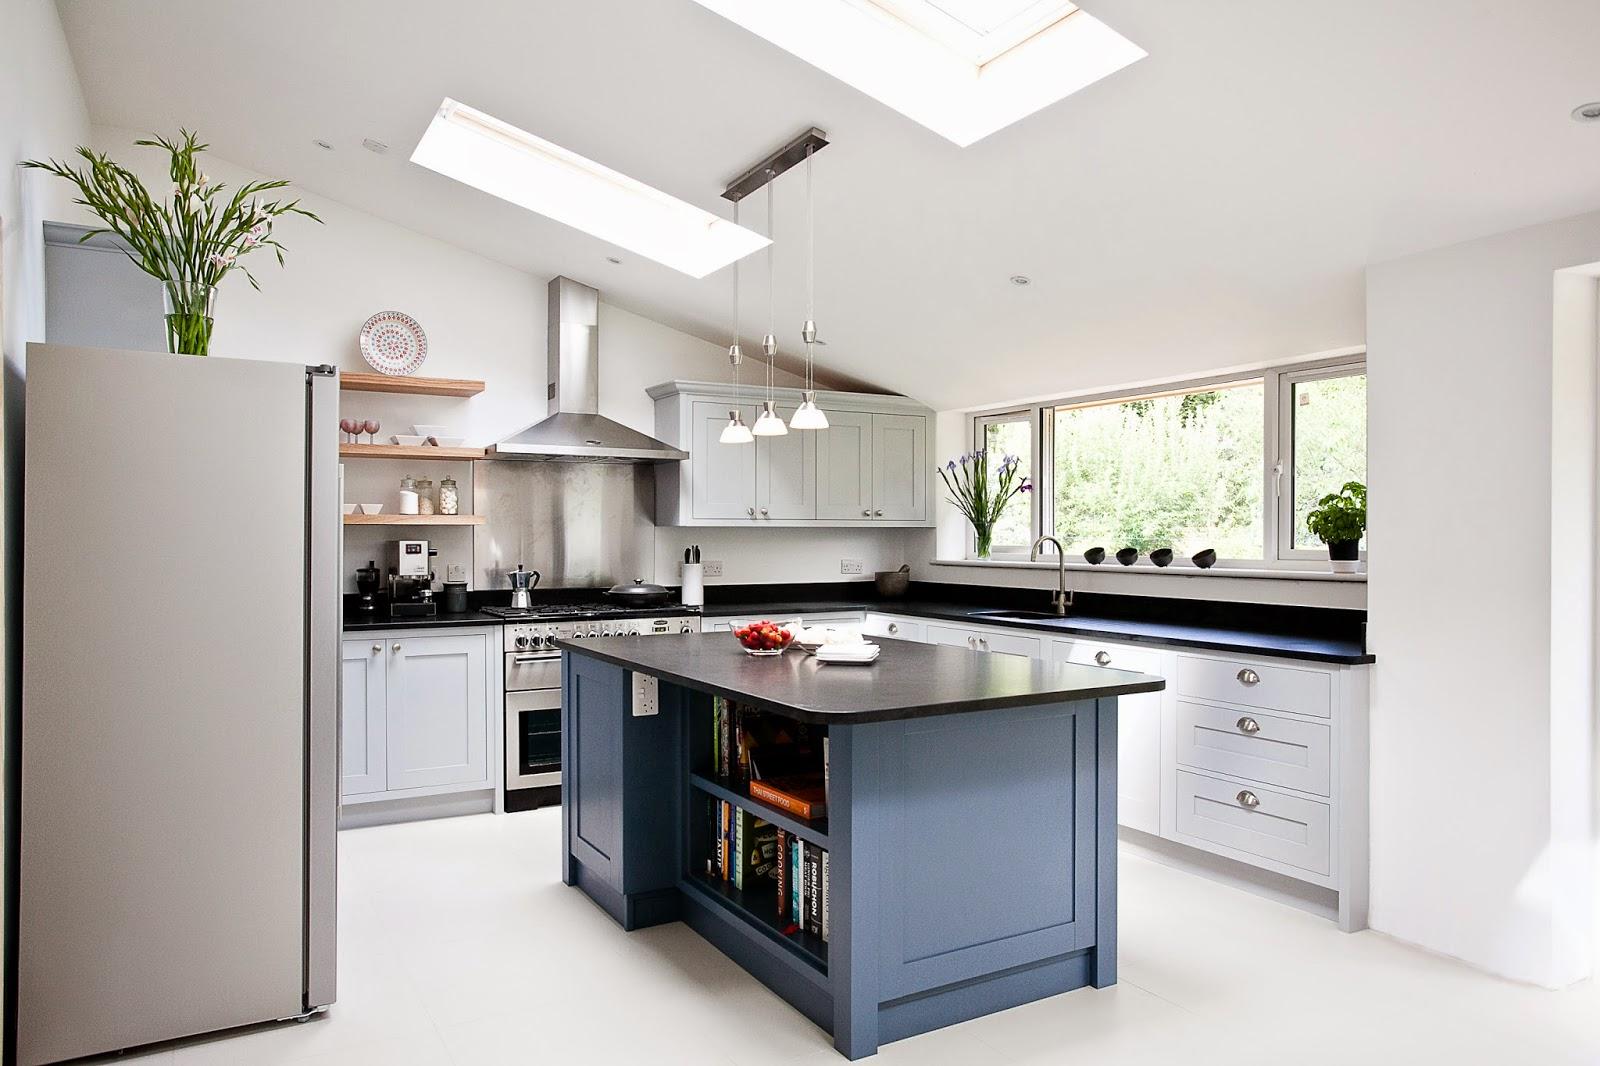 kitchen island thrive shaker kitchen island shaker kitchen 07 shaker kitchen island blue grey kitchen